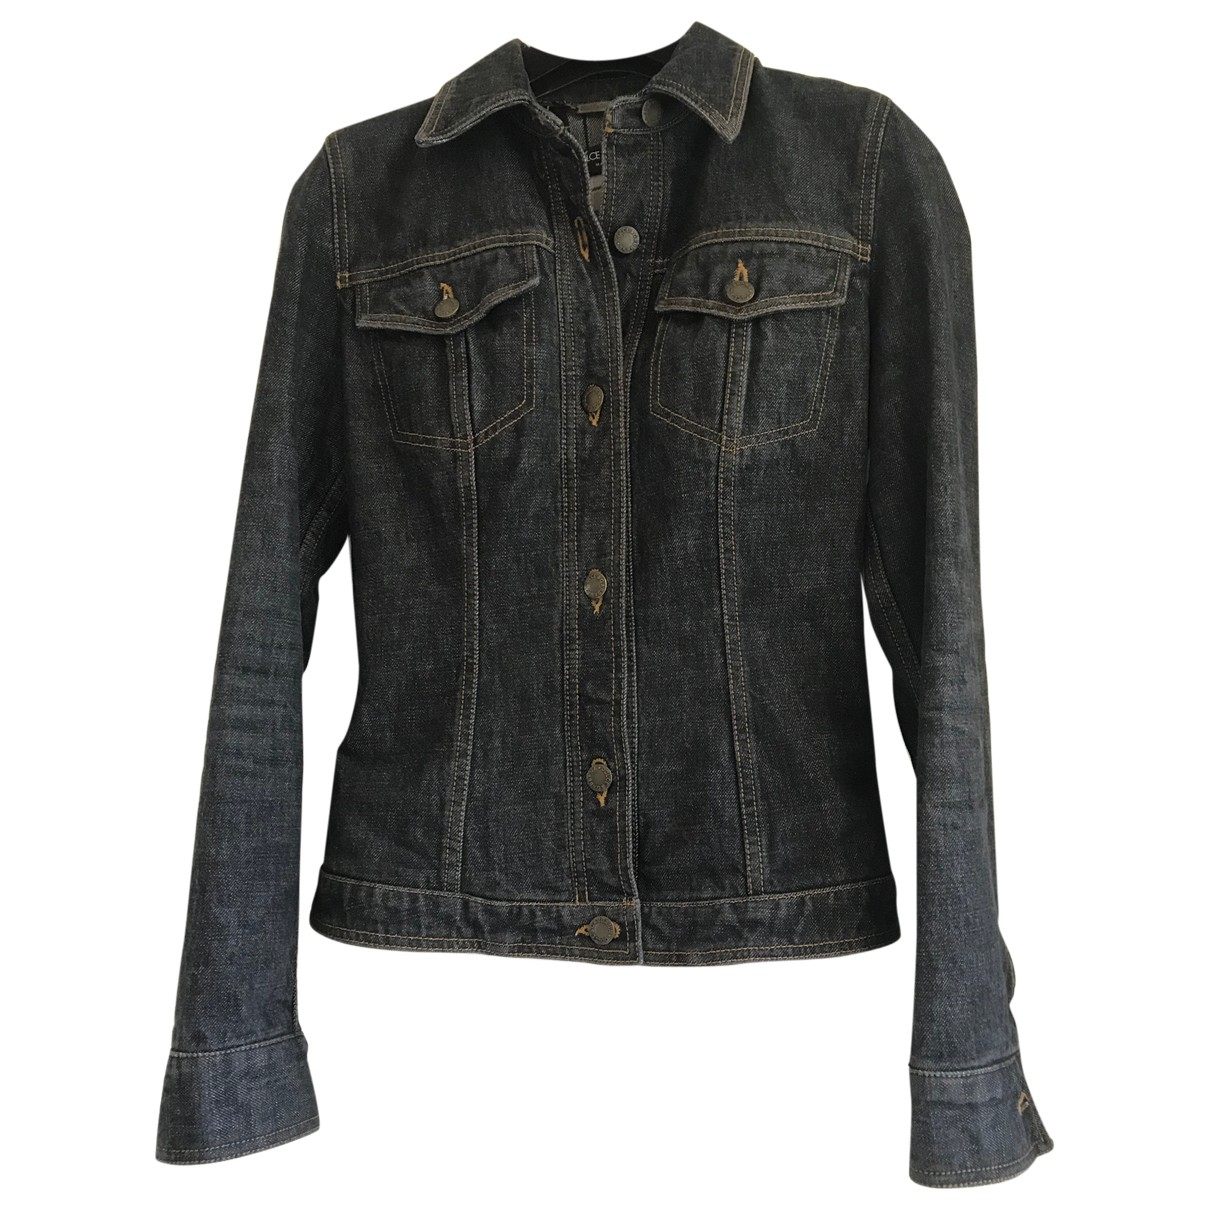 Dolce & Gabbana \N Jacke in  Grau Denim - Jeans